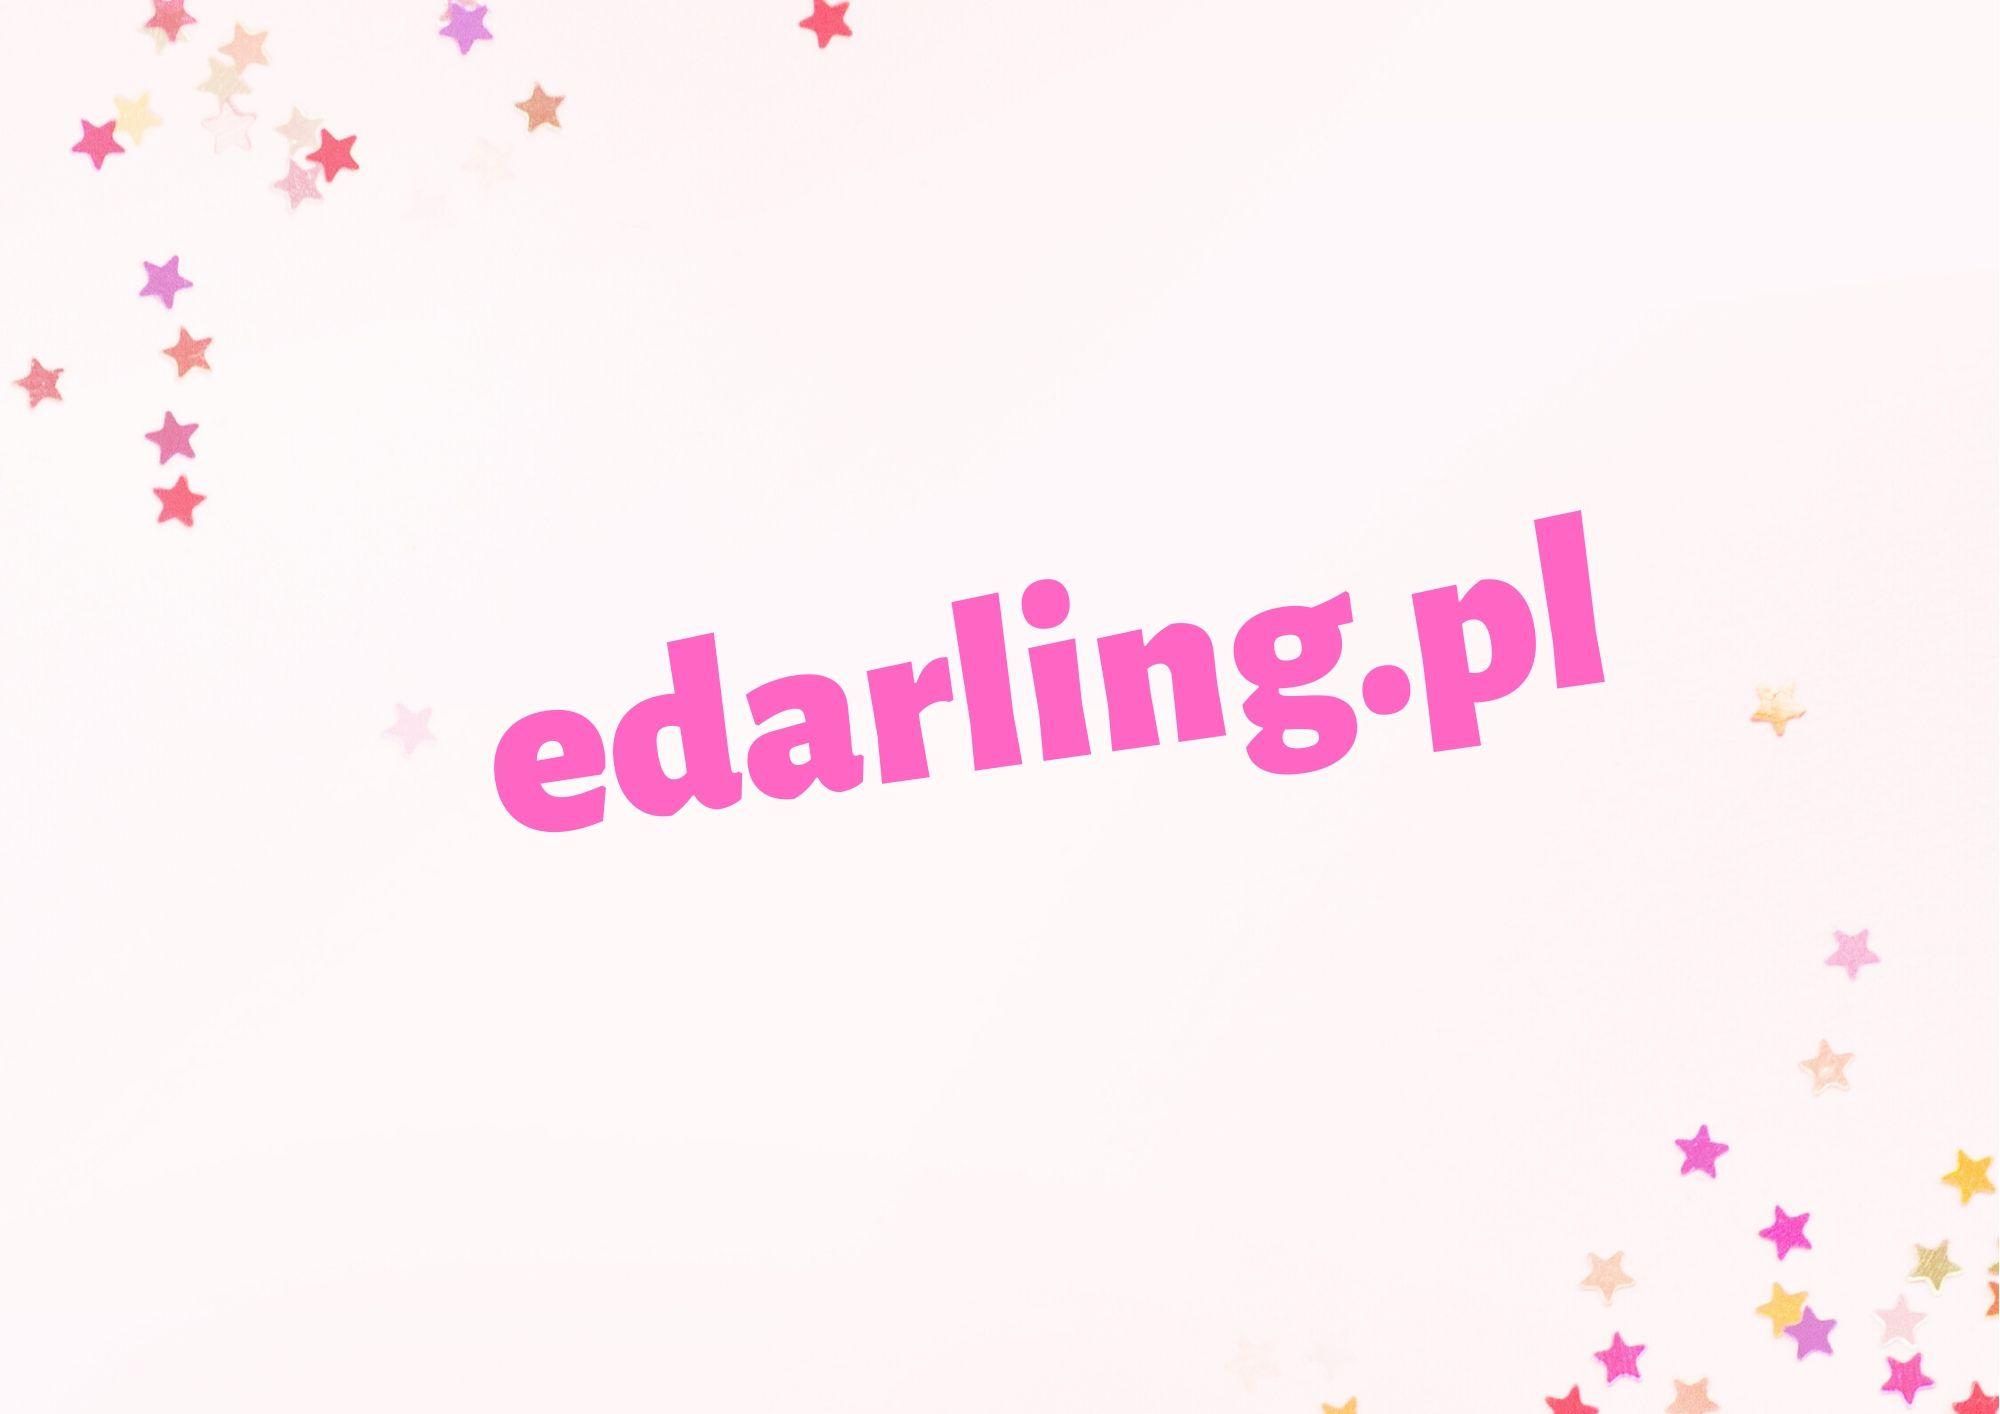 edarling.pl